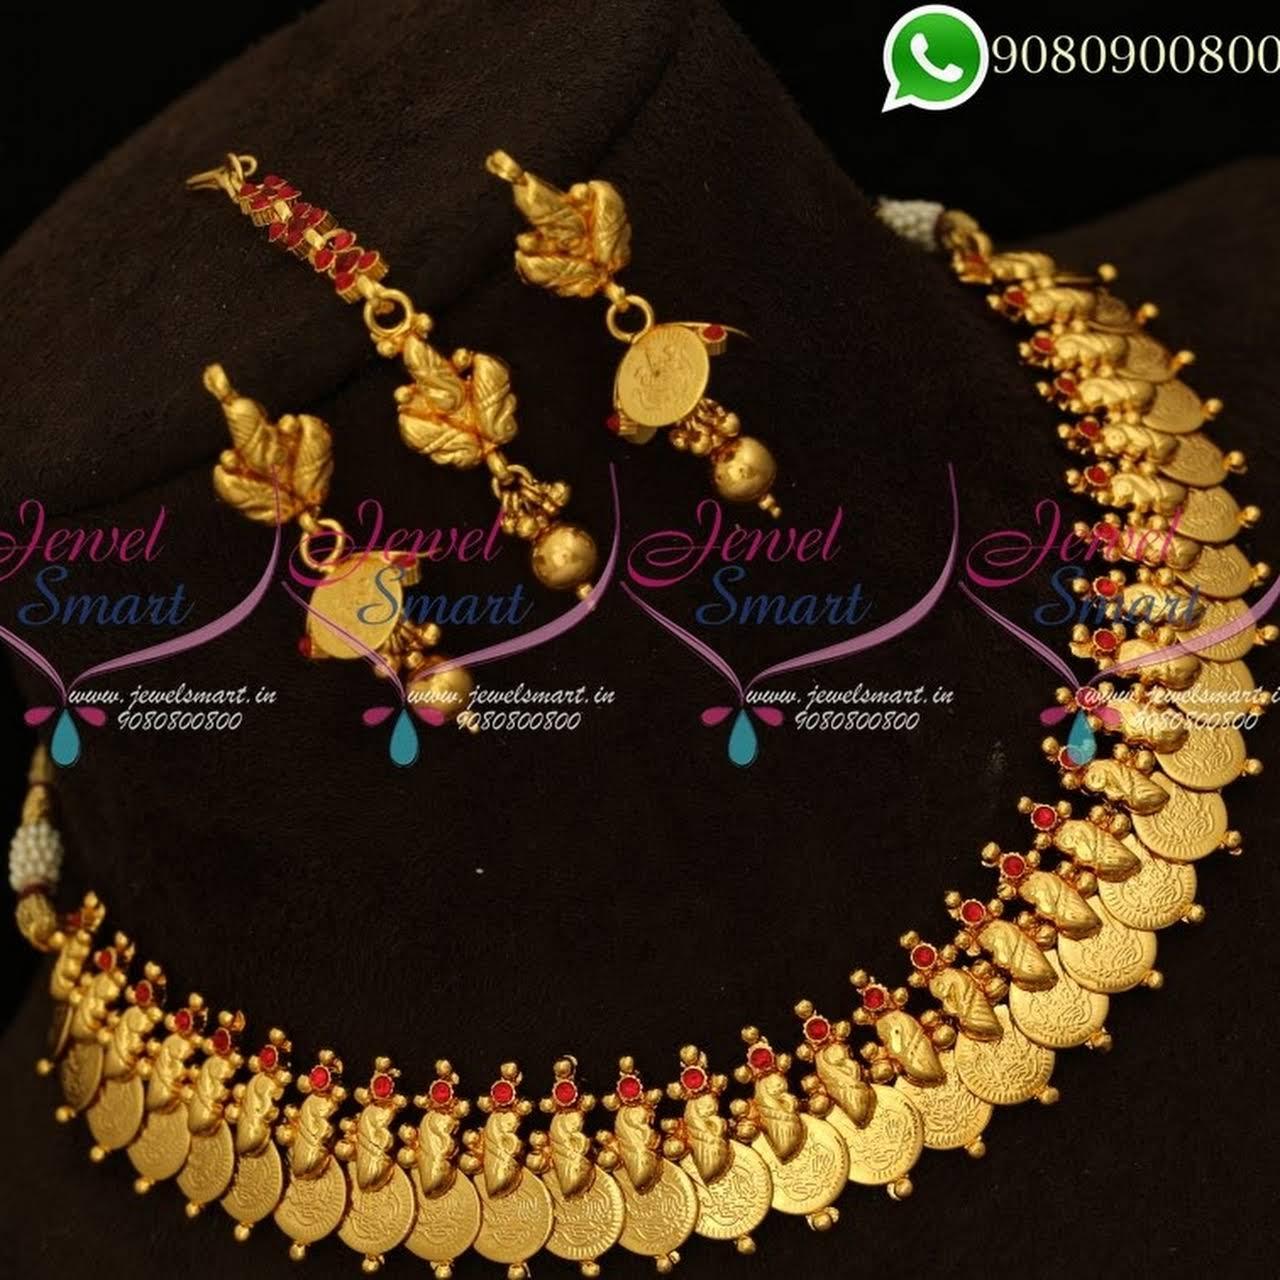 JewelsMart Fashion Jewellery - Jewelry Store in Salem